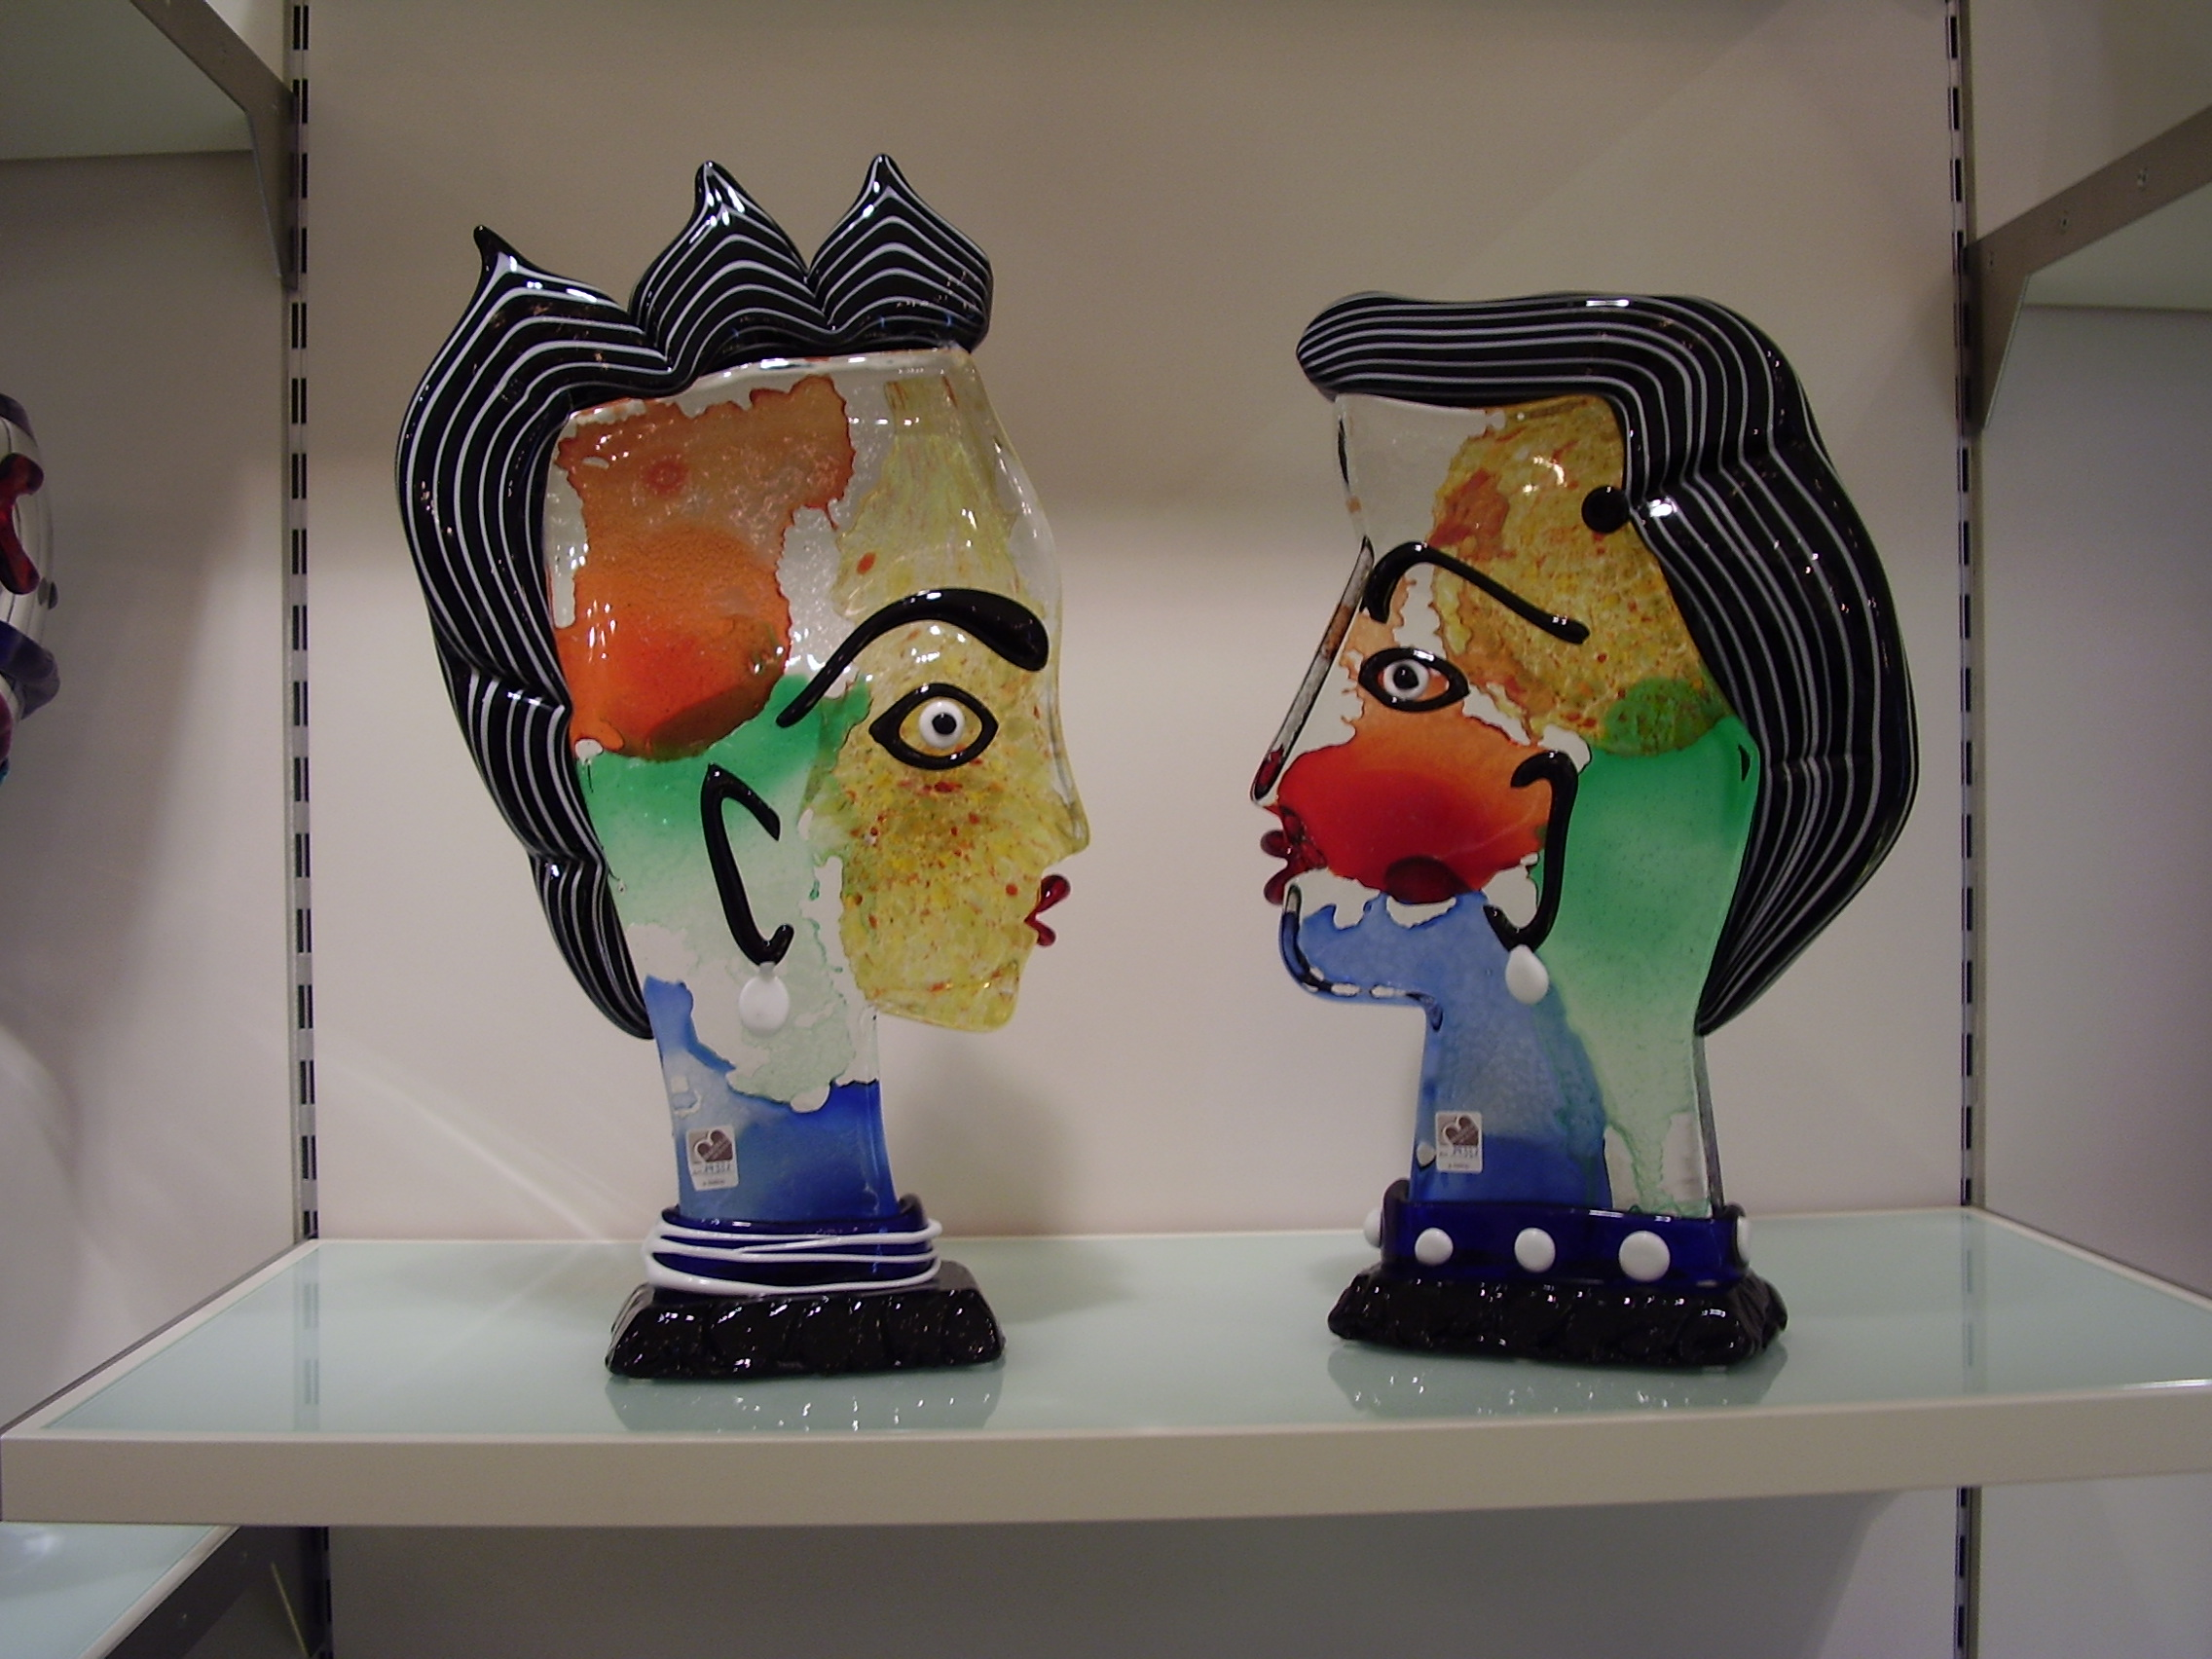 Picasso glass sculpture - Venice private tours